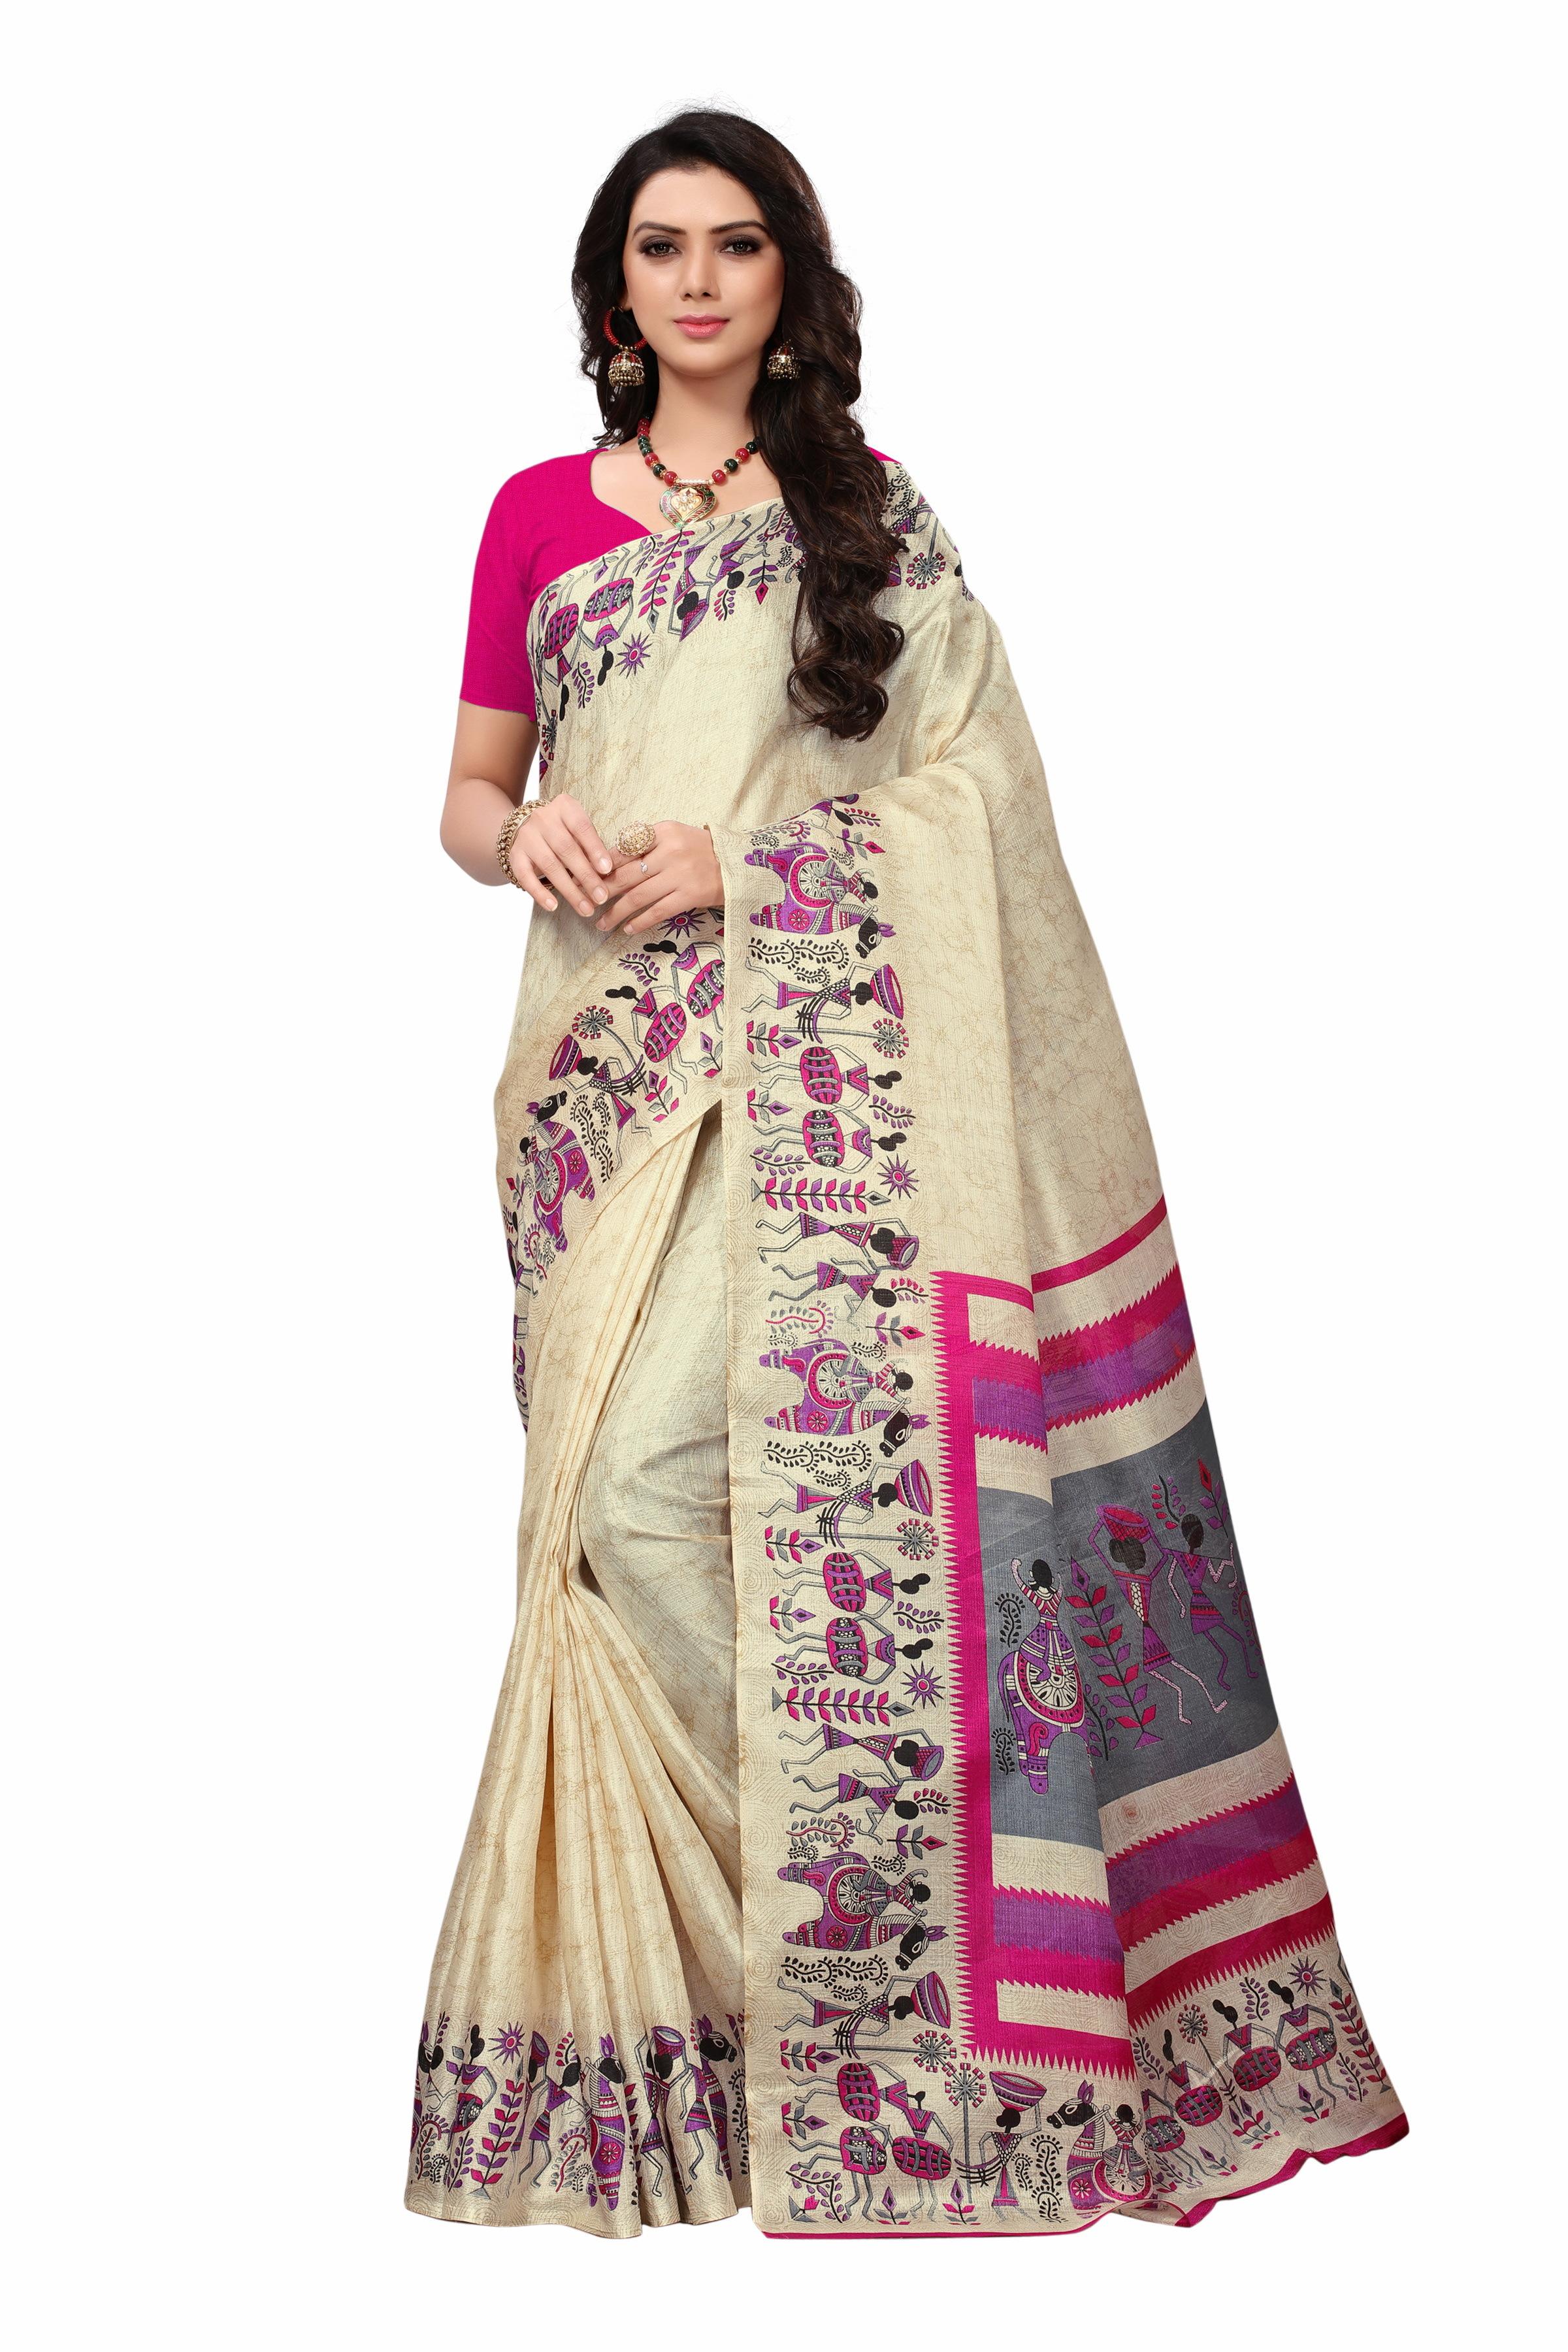 New jute silk saree